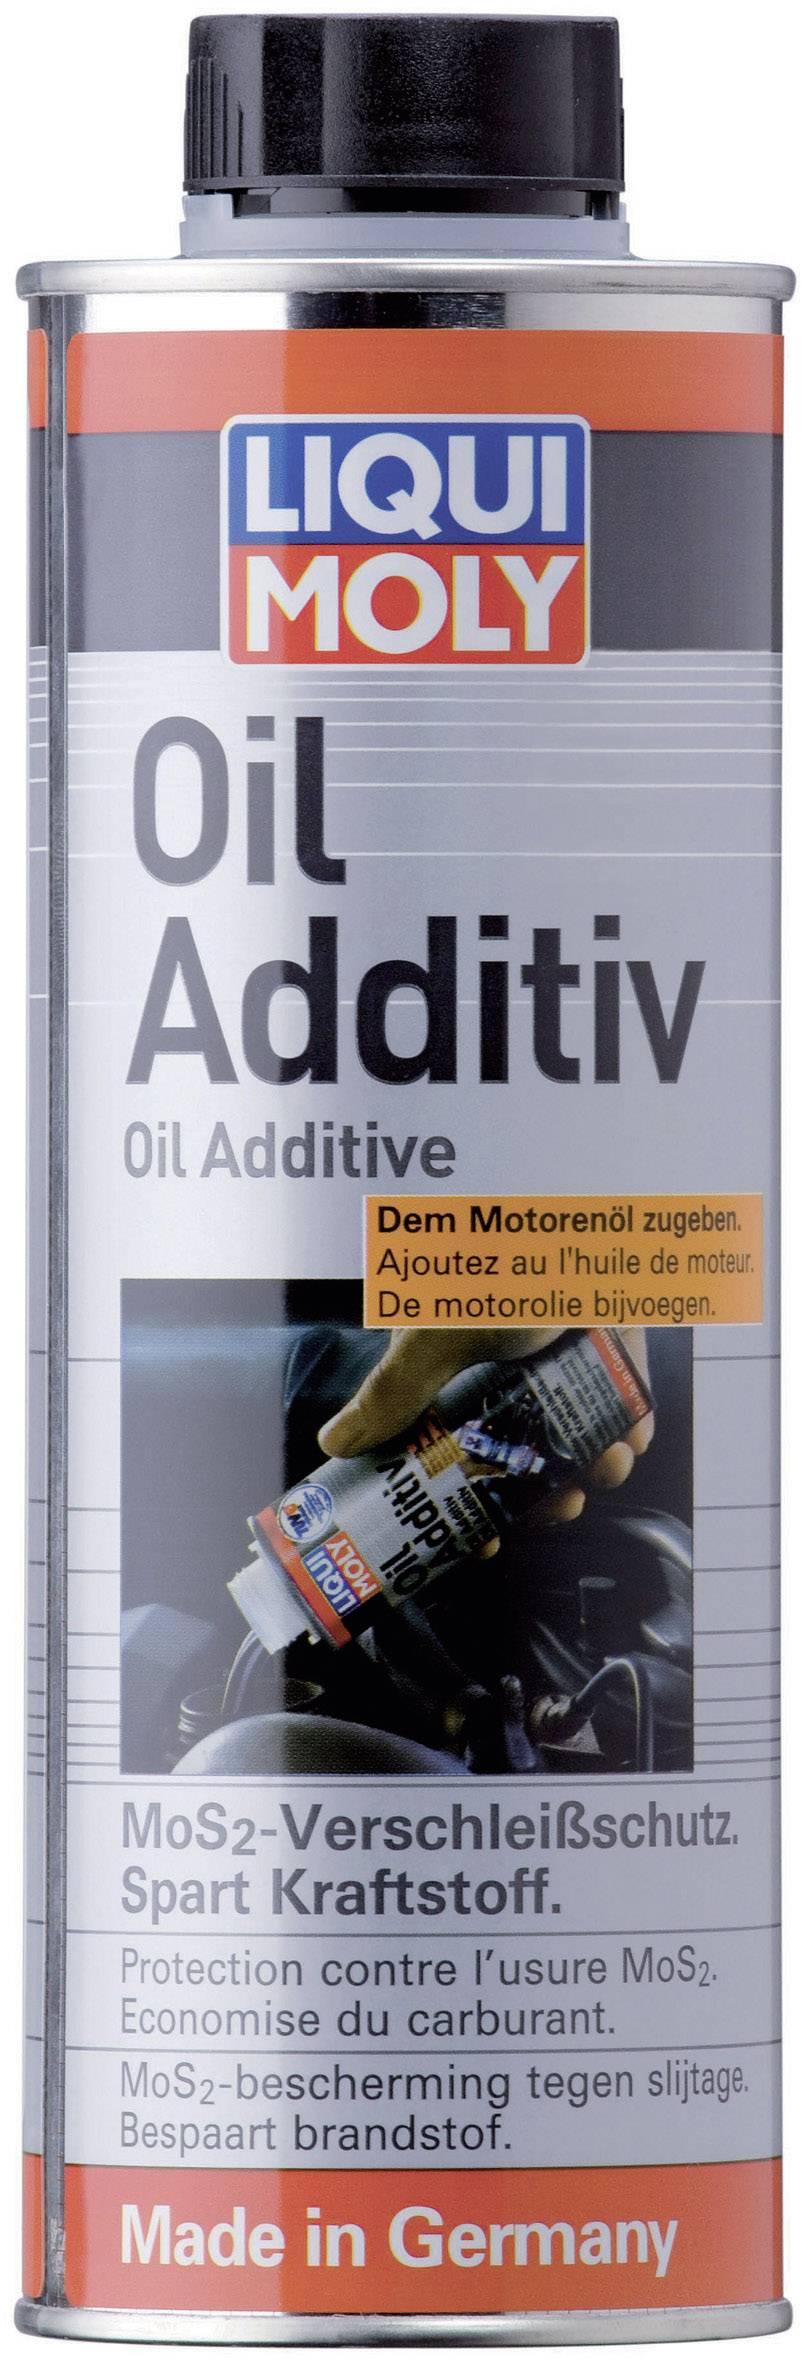 Oil Additive Liqui Moly 1013 500 ml   Conrad com